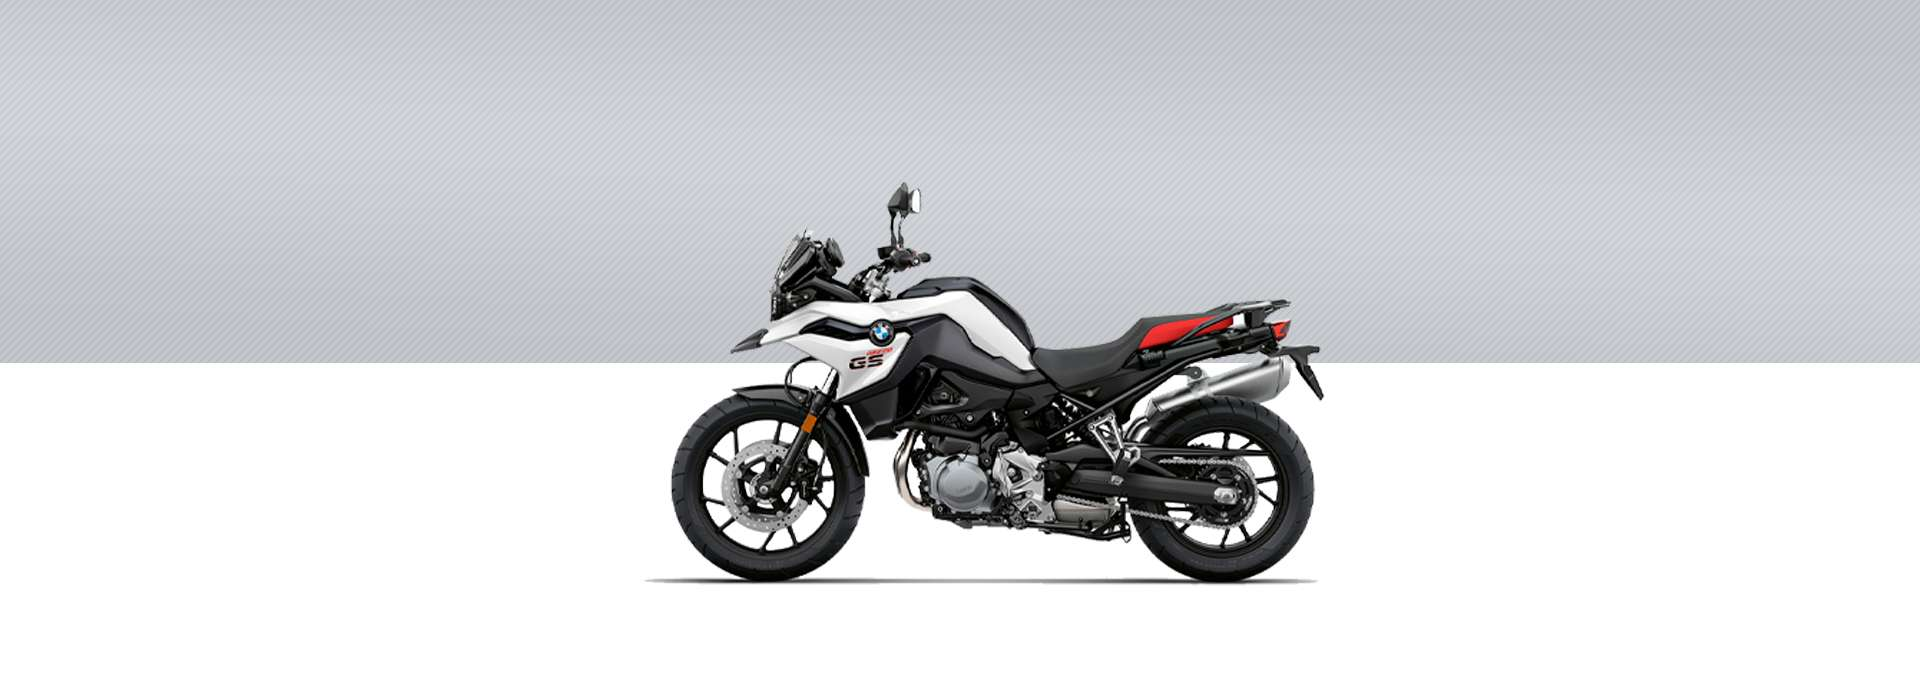 BMW Motorrad F 750 GS